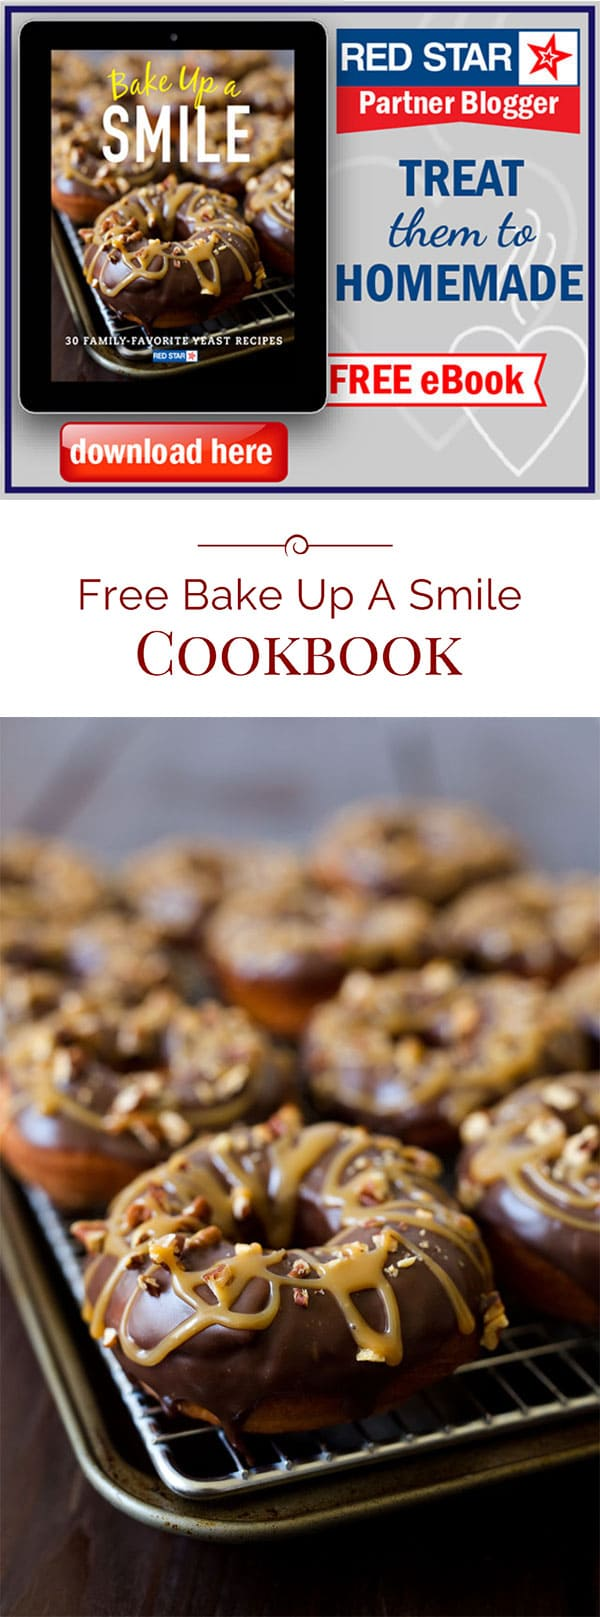 Free-Bake-Up-A-Smile-Cookbook-Pin